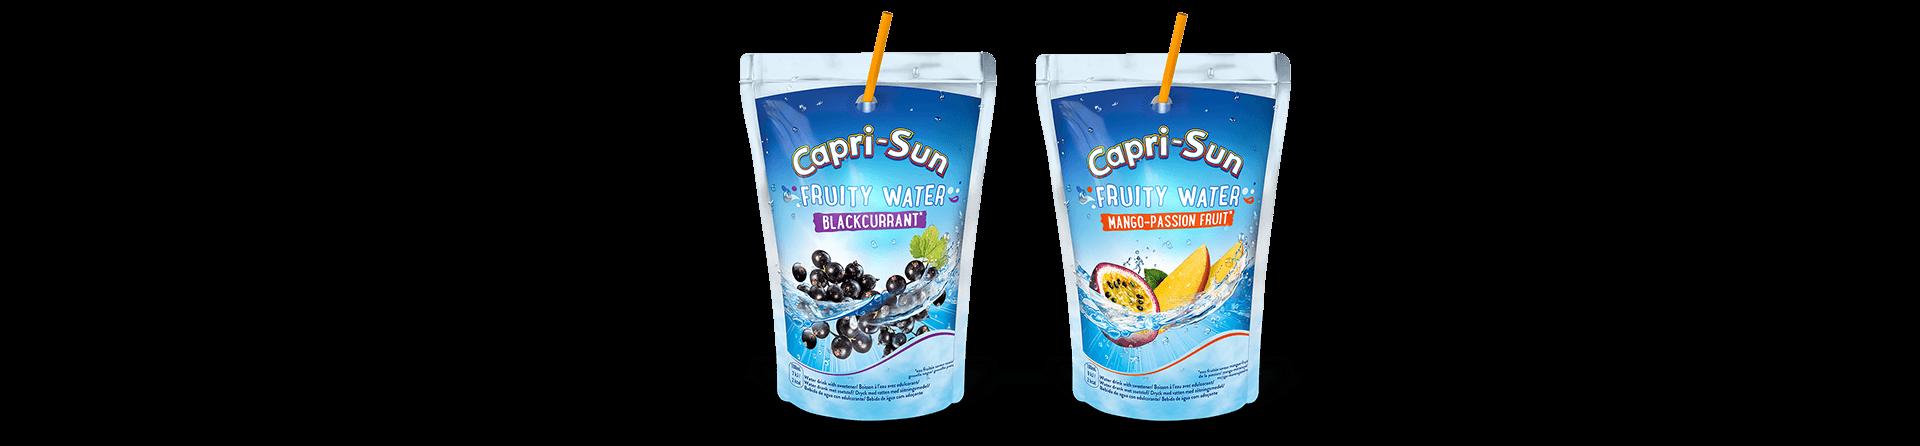 Capri-Sun Fruity Water